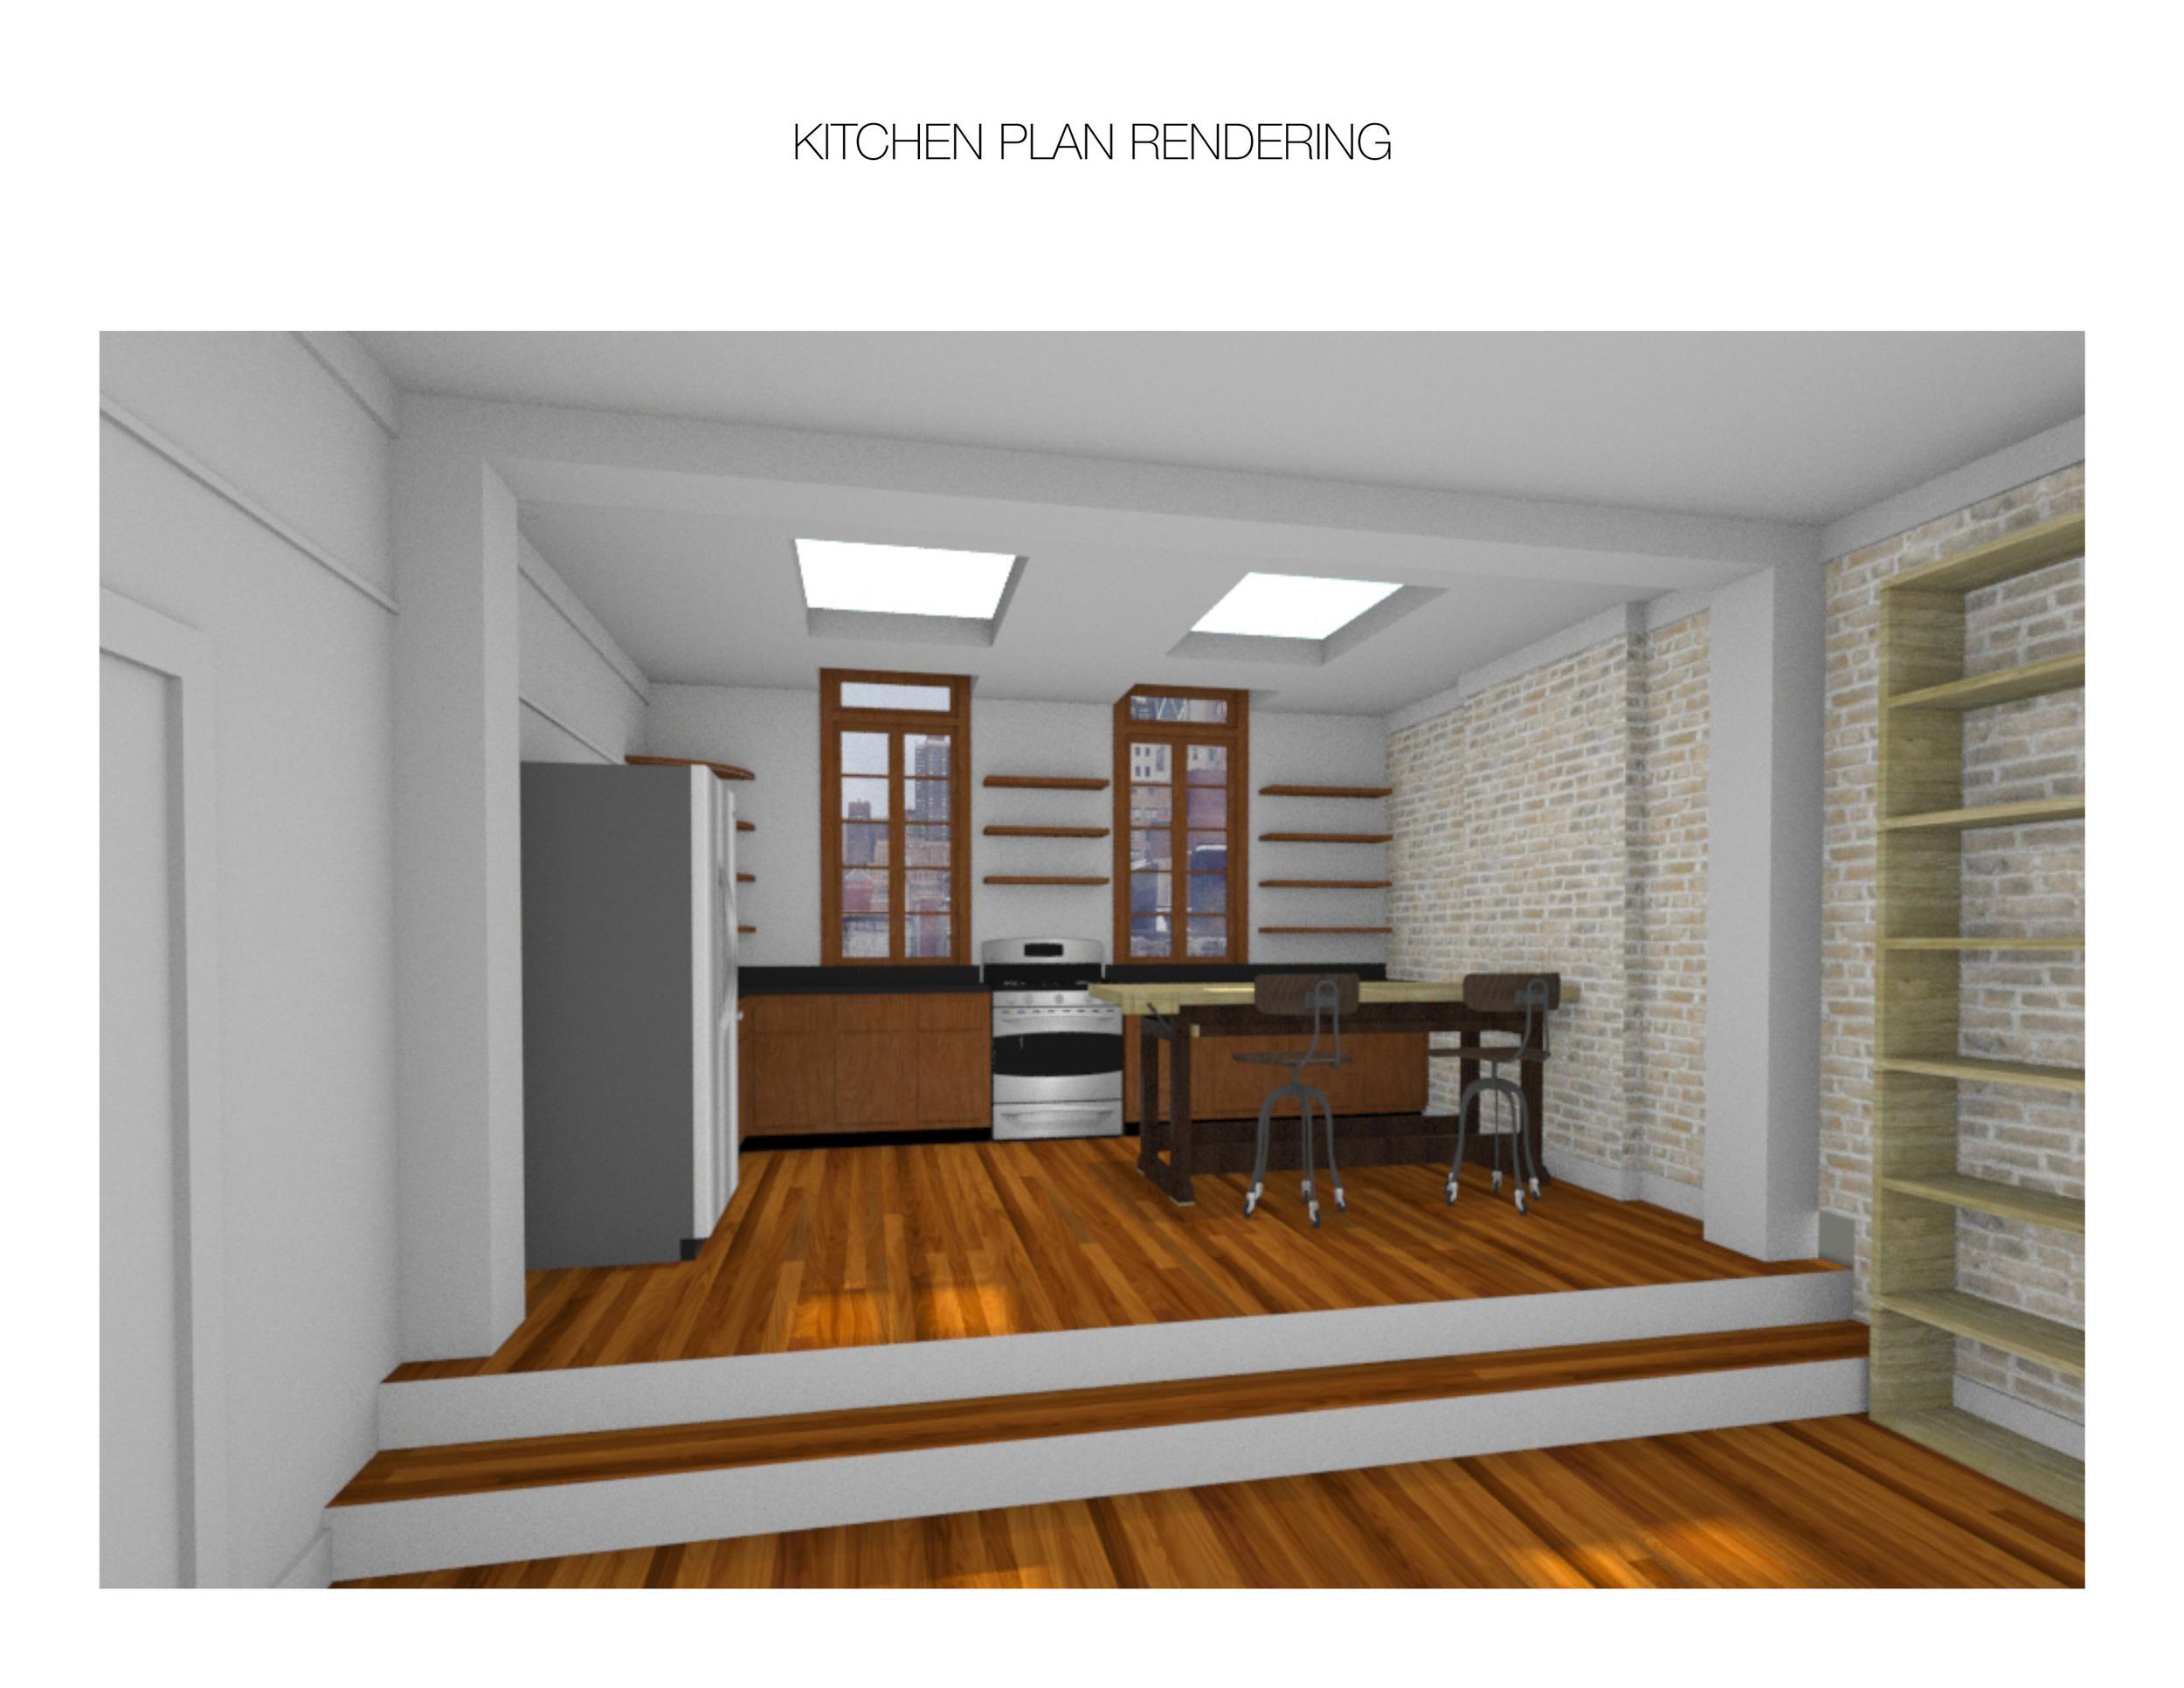 Dev's Apartment Rendering